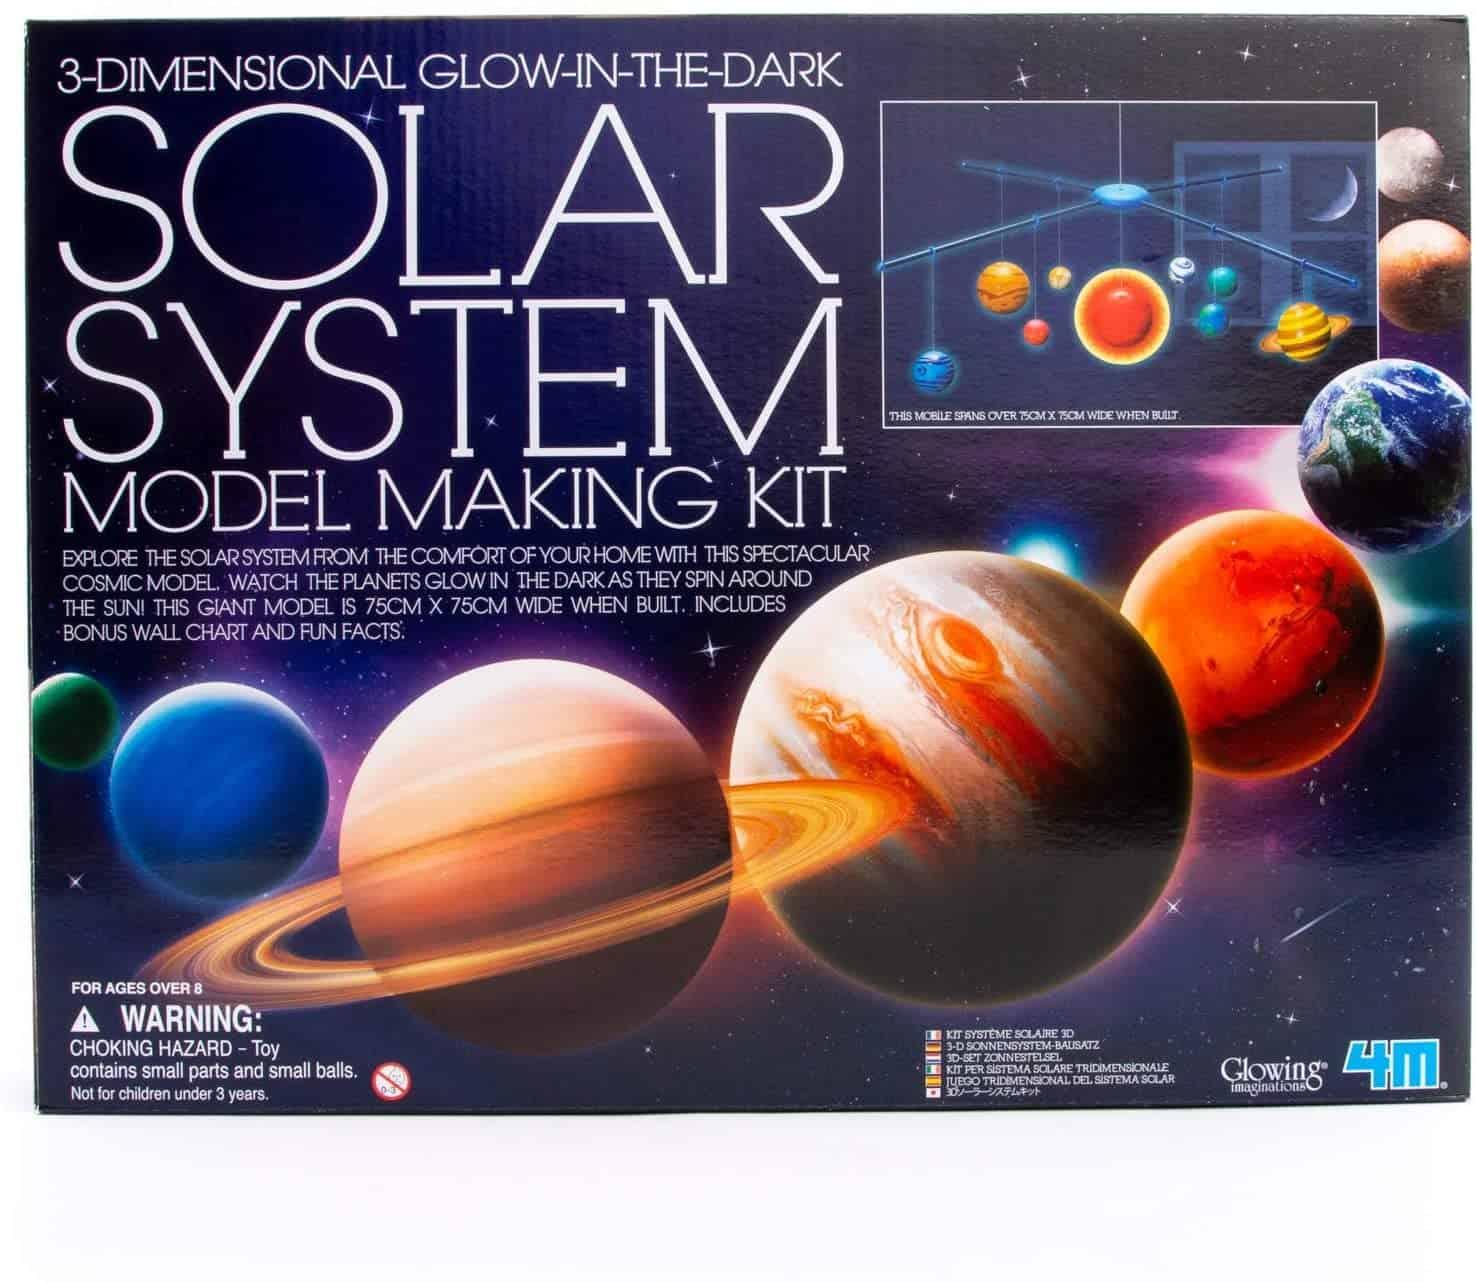 4M 3D Glow-in-the-Dark Solar System Mobile Making Kit -